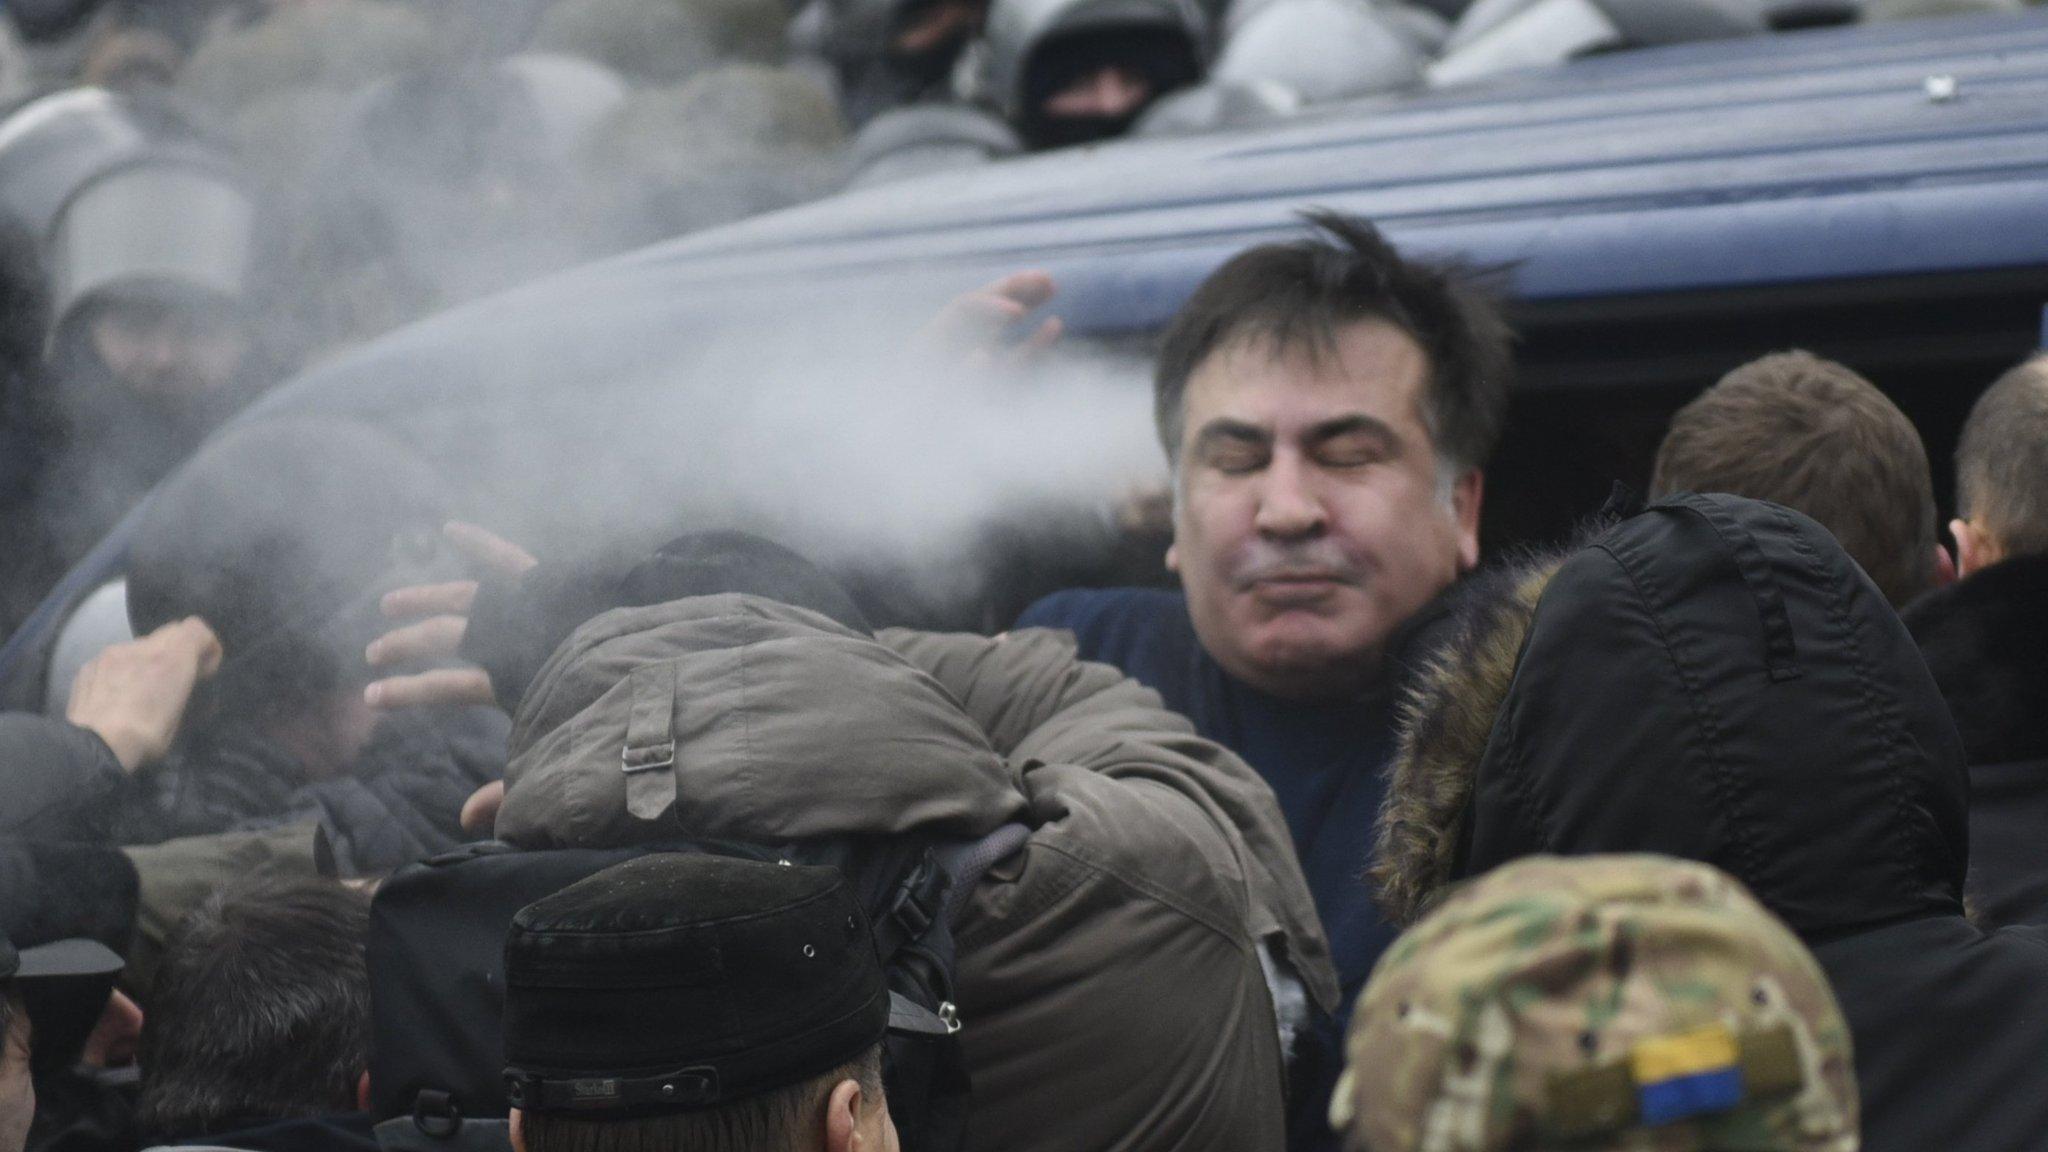 Supporters free arrested Mikheil Saakashvili from Ukraine police van